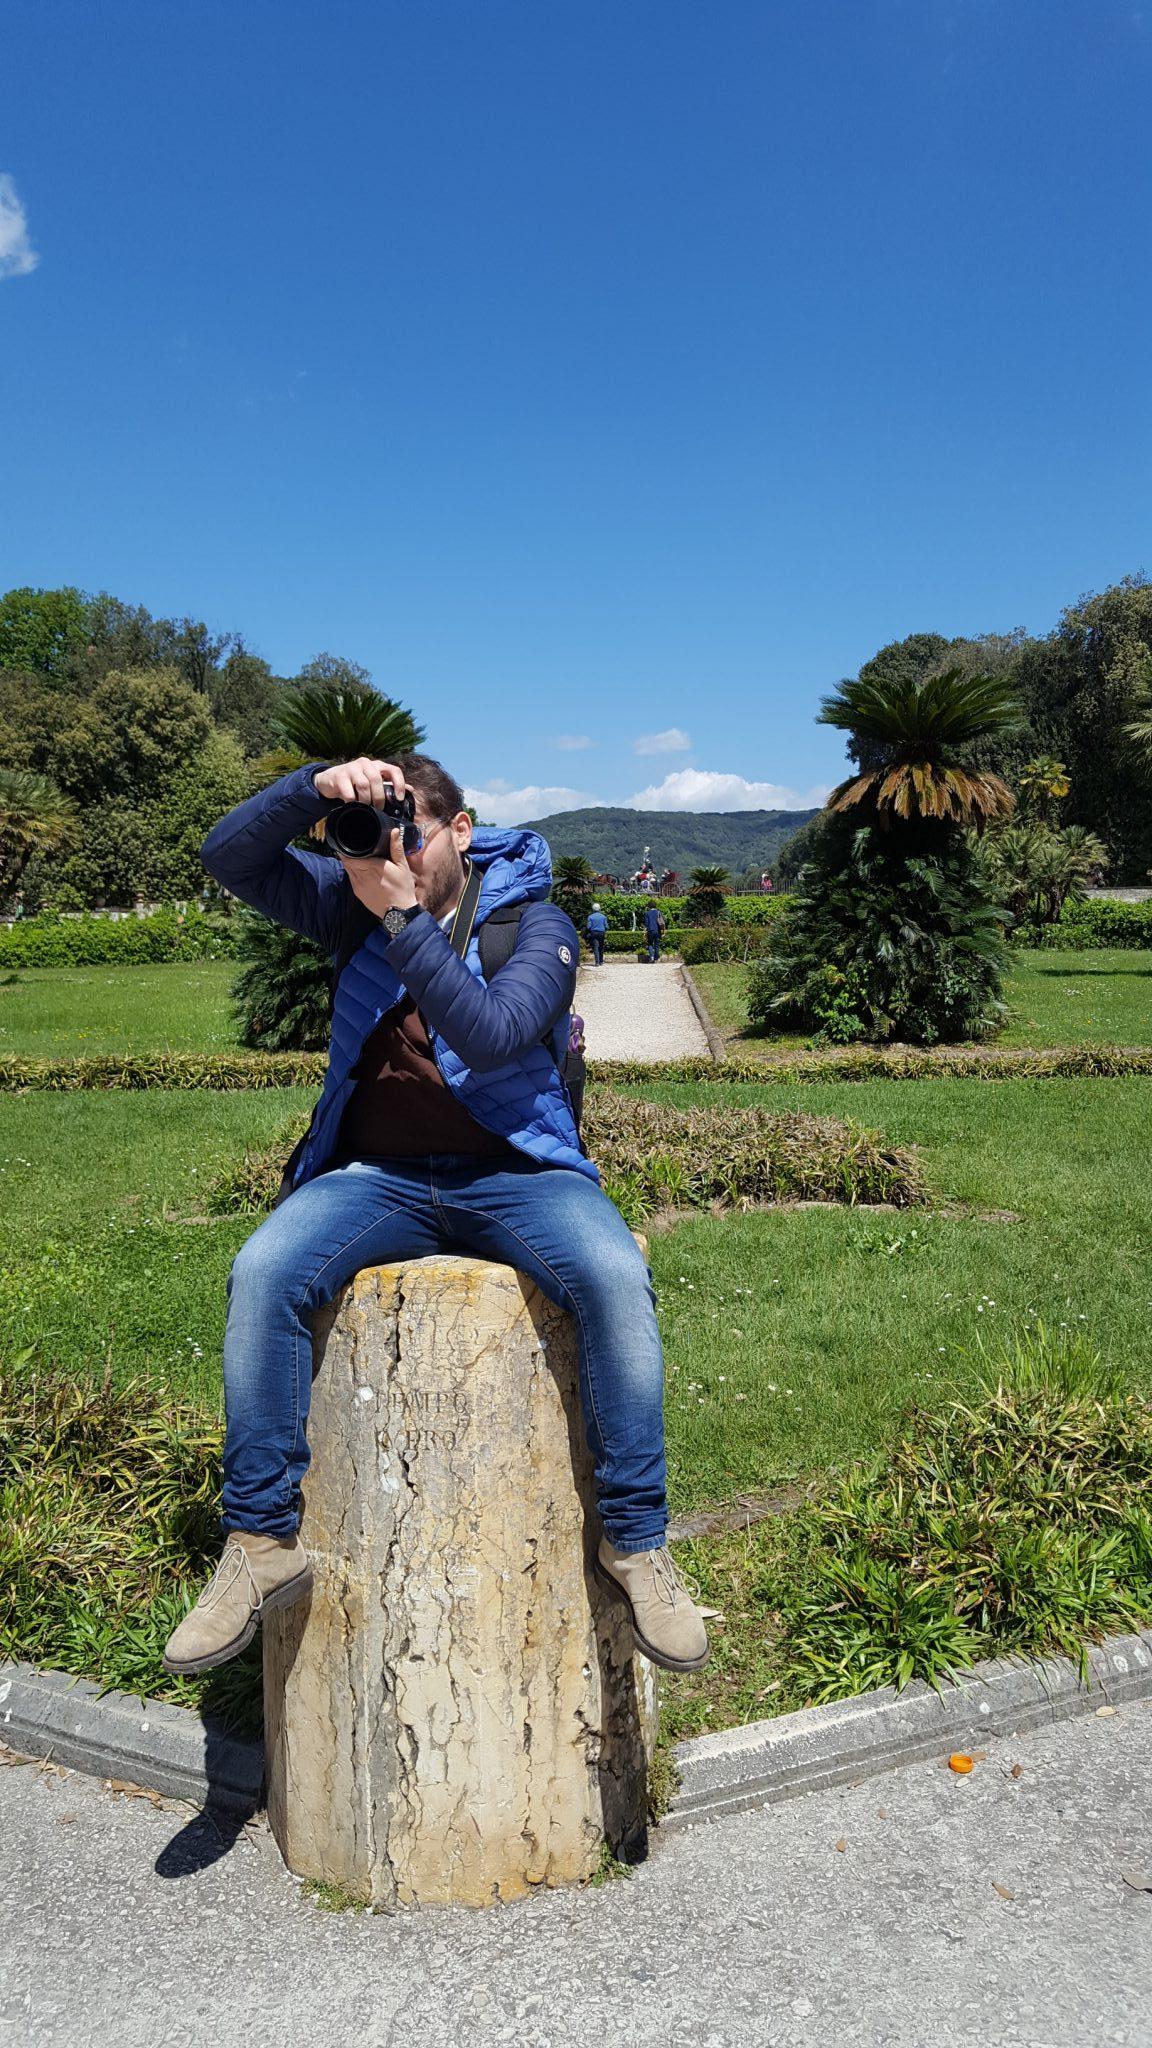 Photo of ME! - Luciano Blancato